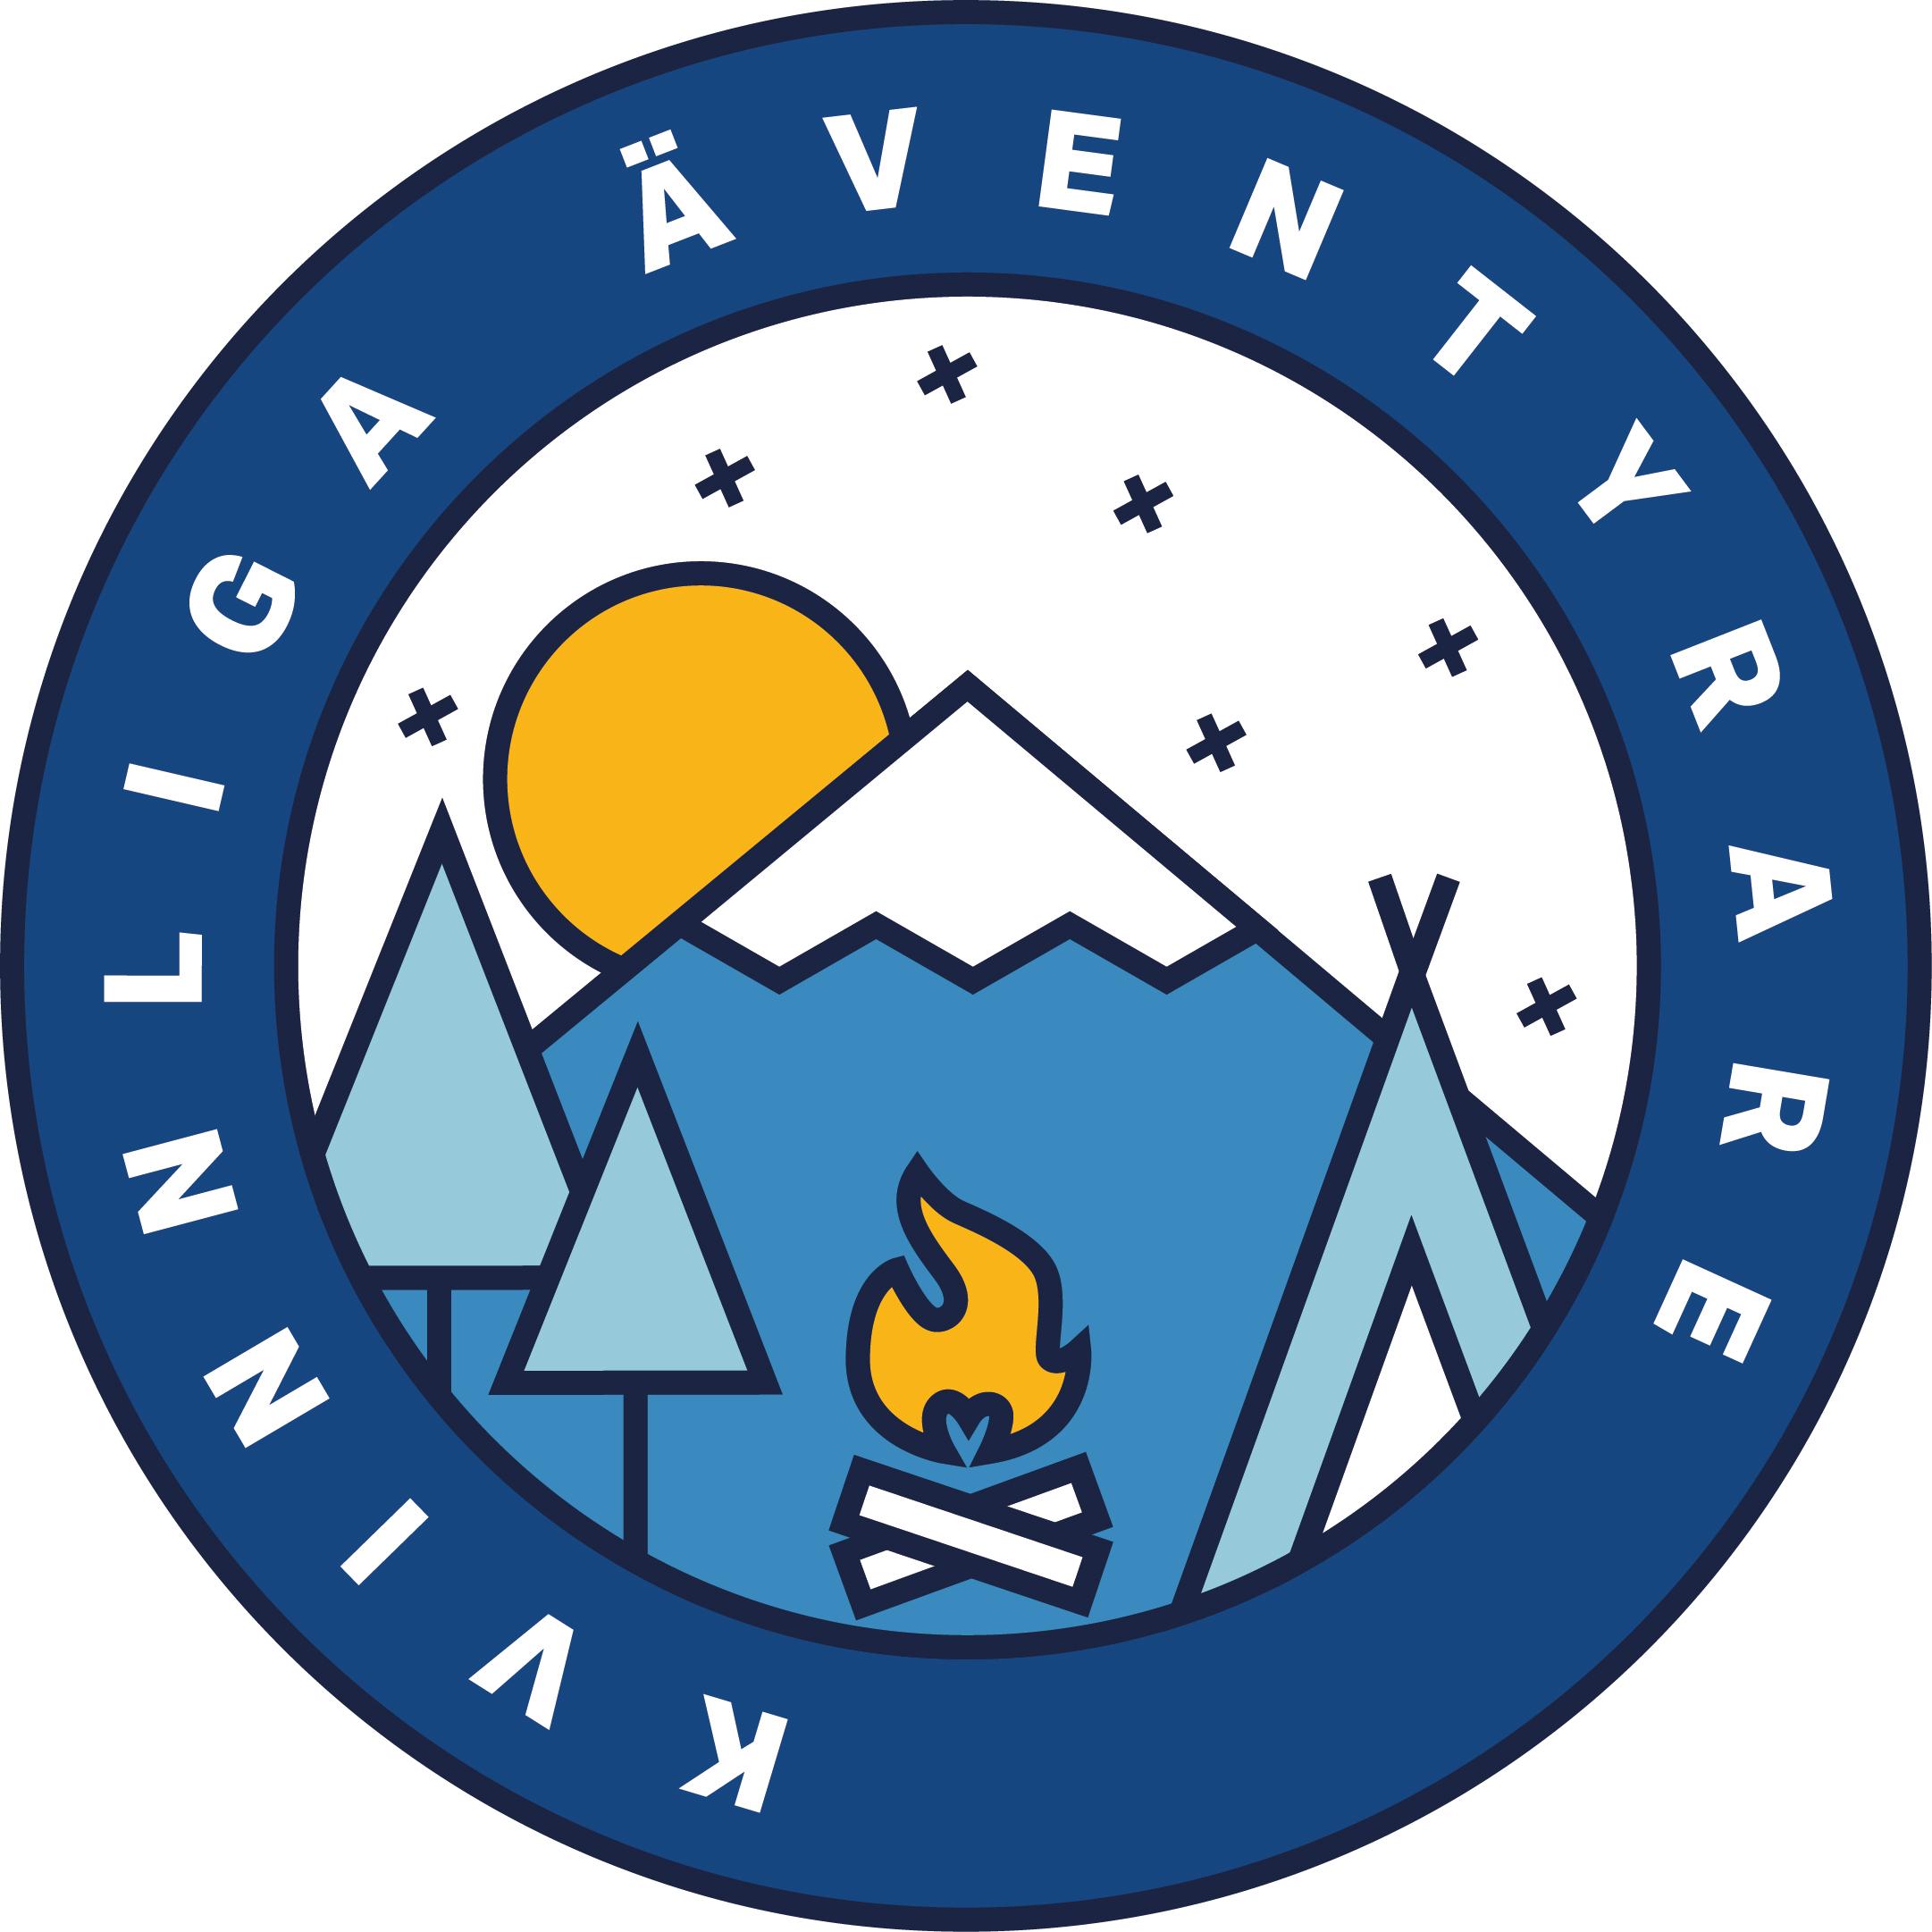 Kvinnliga-Aventyrare-logga-logo